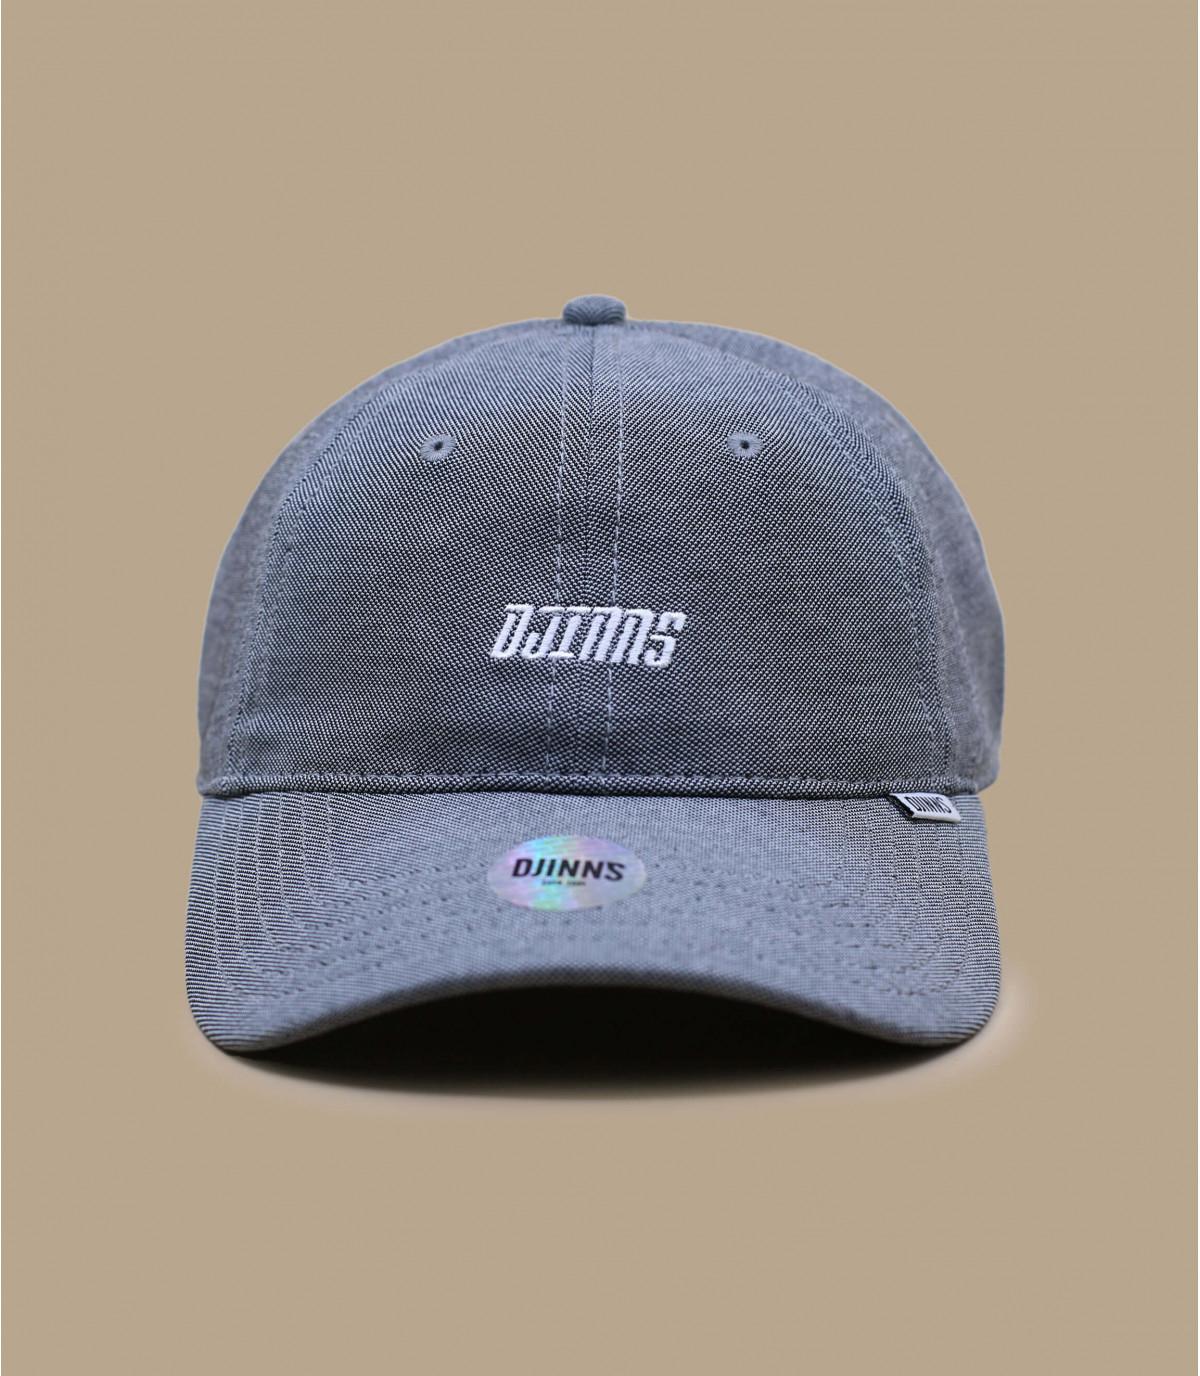 zwarte Djinns curve cap